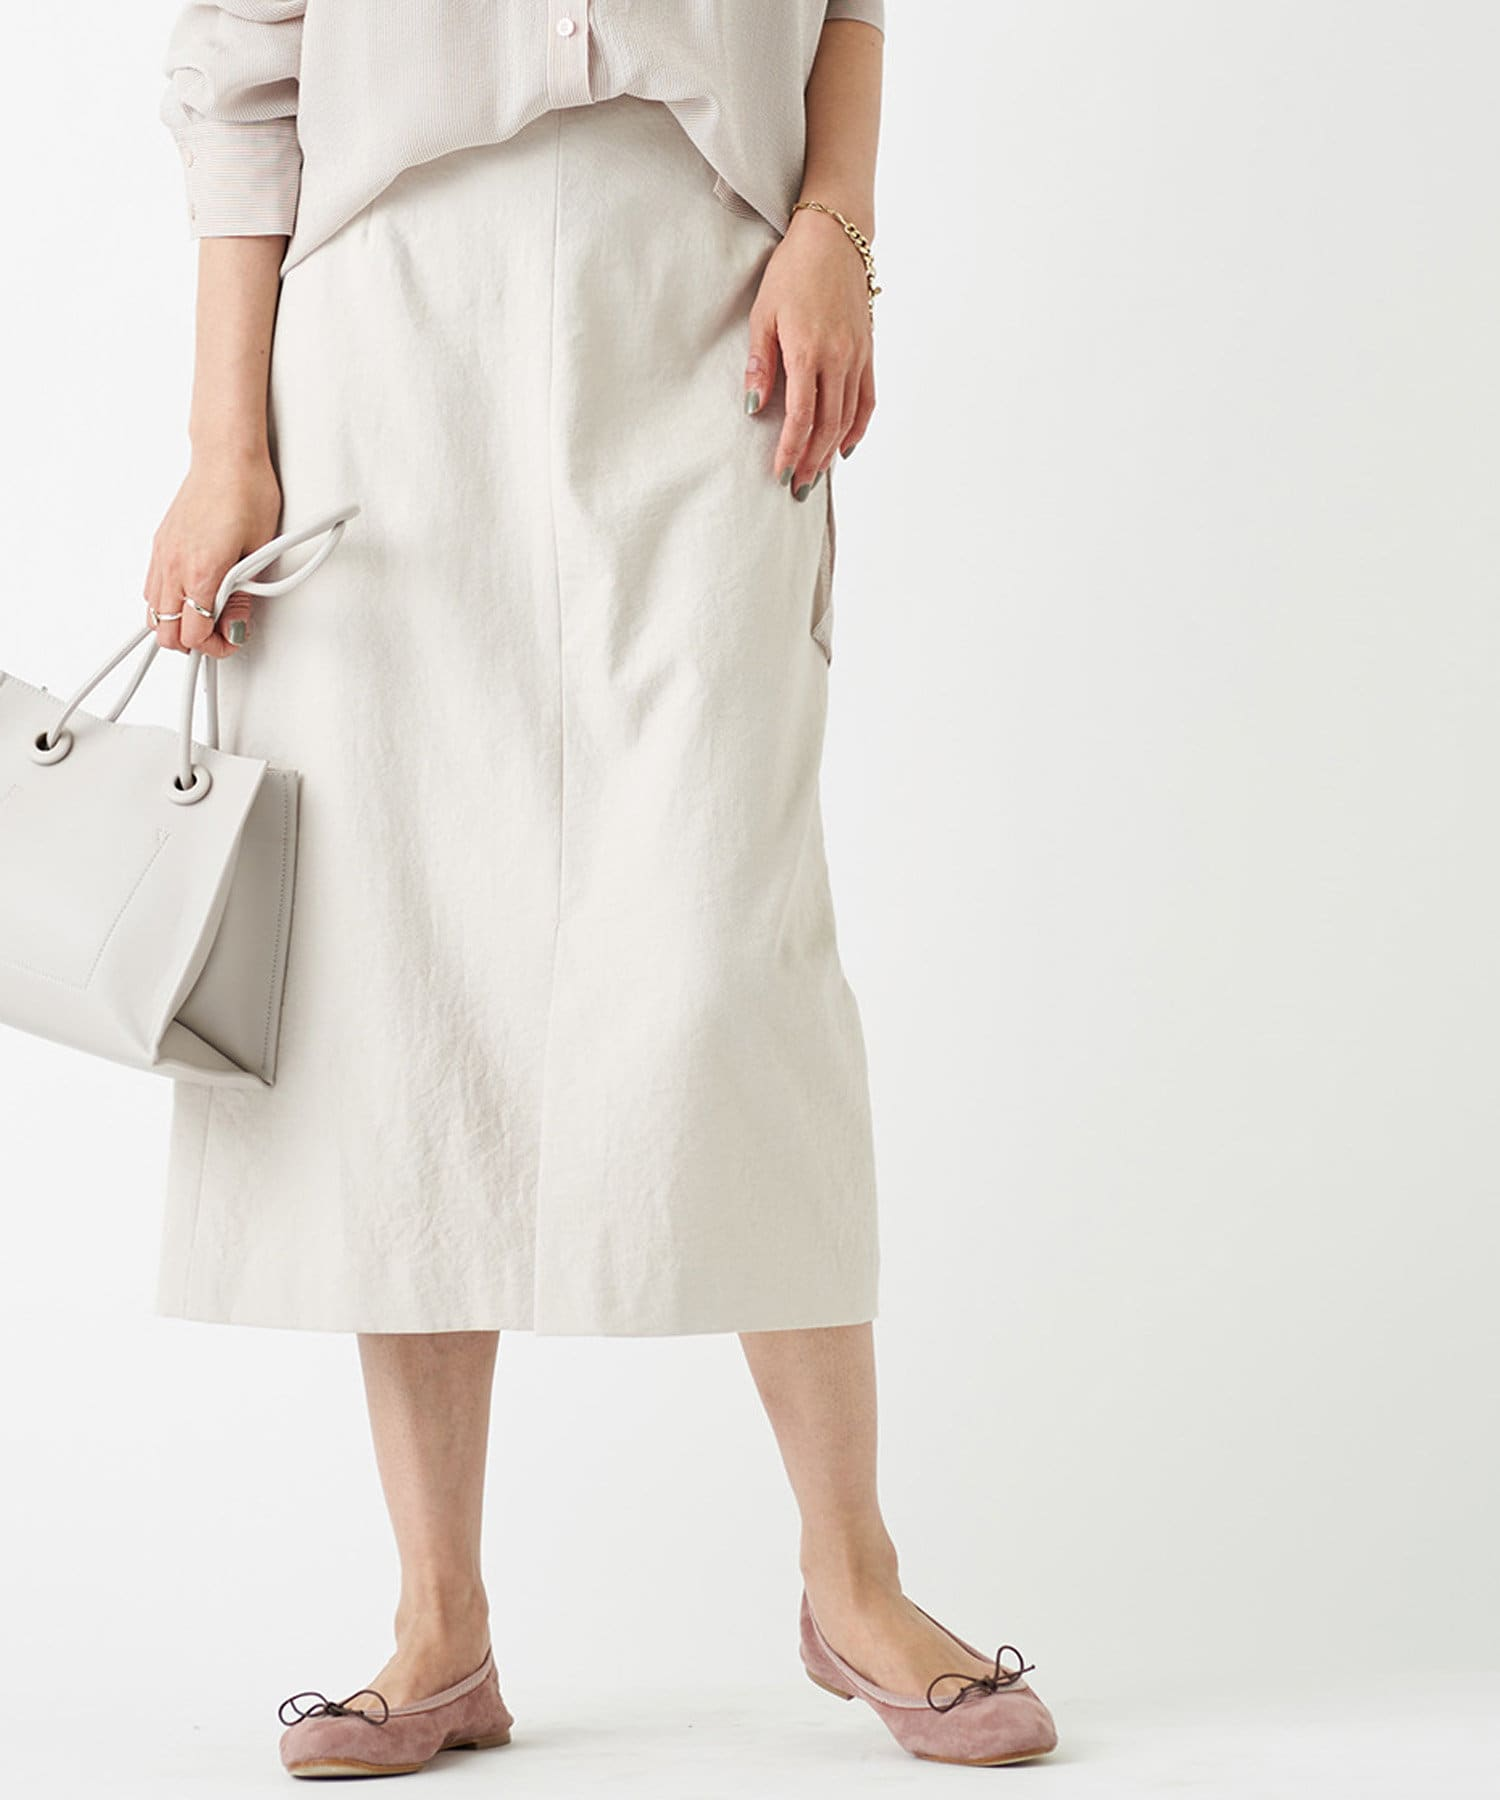 RIVE DROITE(リヴドロワ) 【女性らしさを高めてくれる一枚】オックススリットスカート